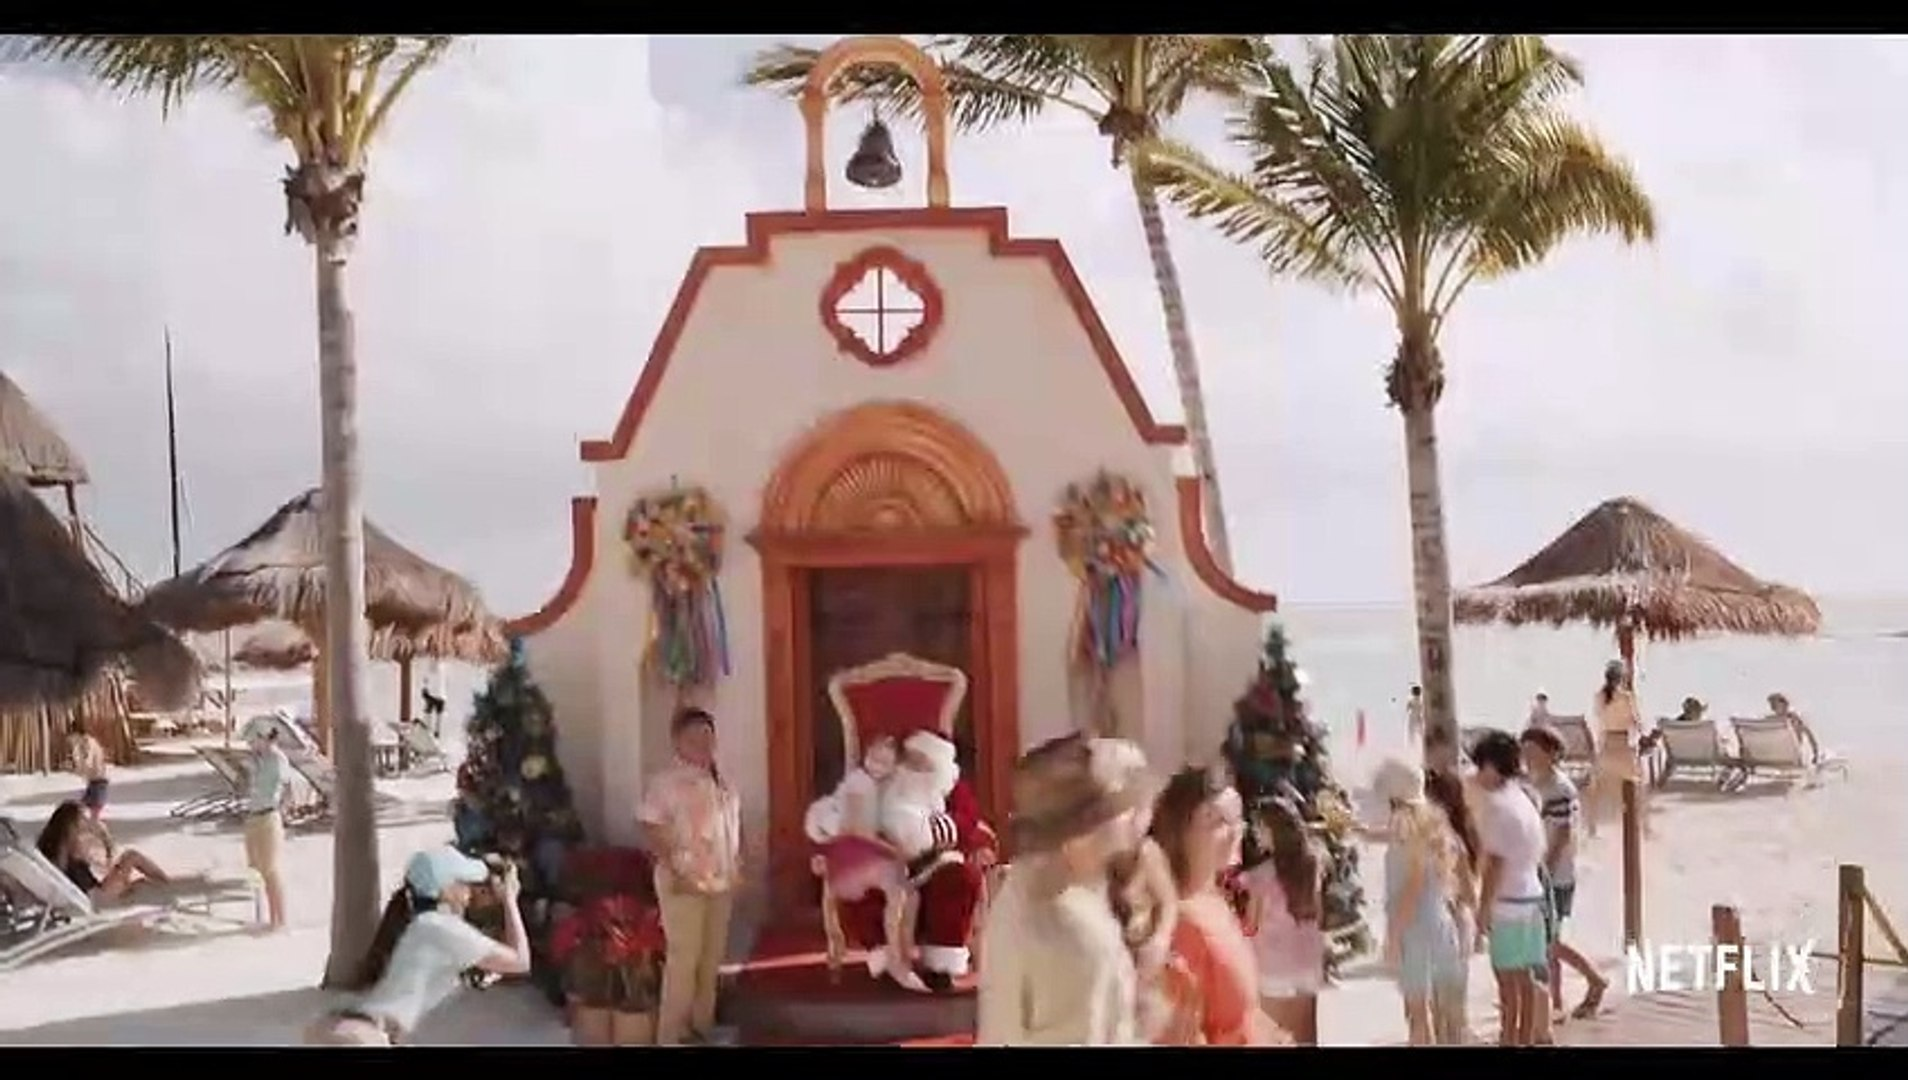 THE CHRISTMAS CHRONICLES 2 Fragman(2020)